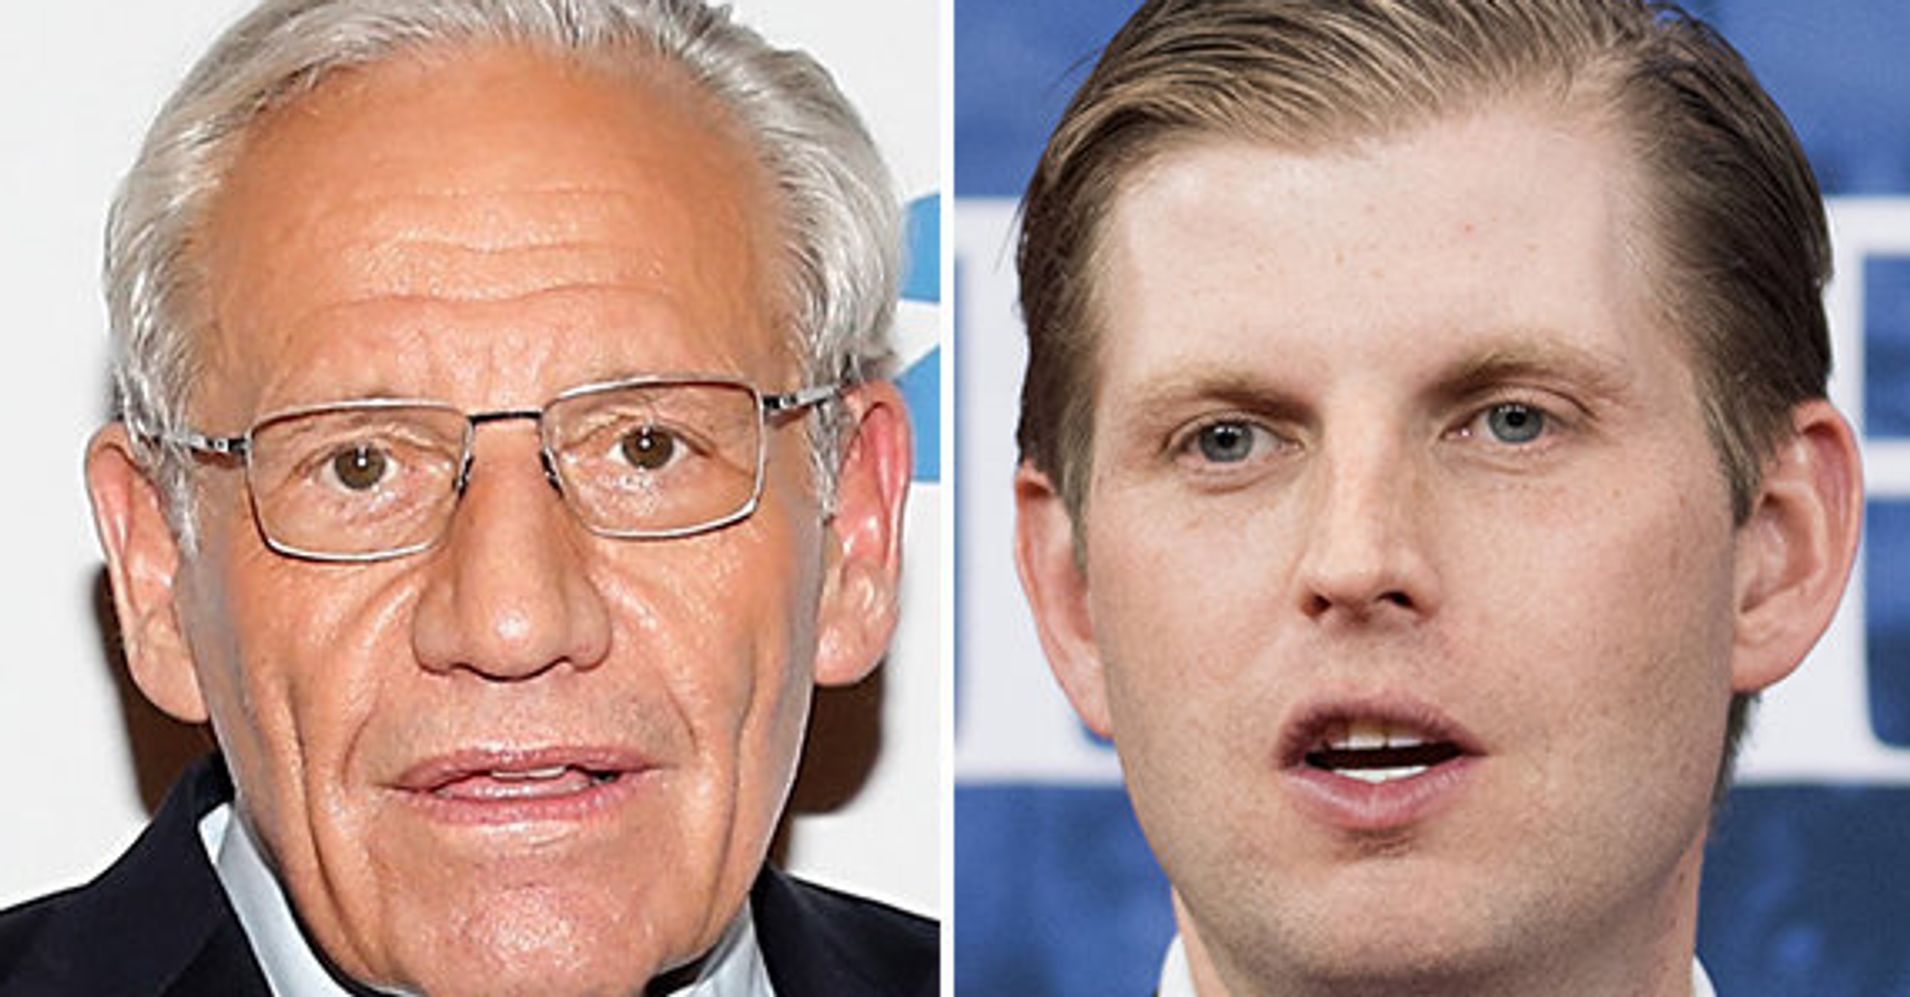 Bob Woodward Fires Back At Eric Trump Over 'Anti-Semitic' Slur